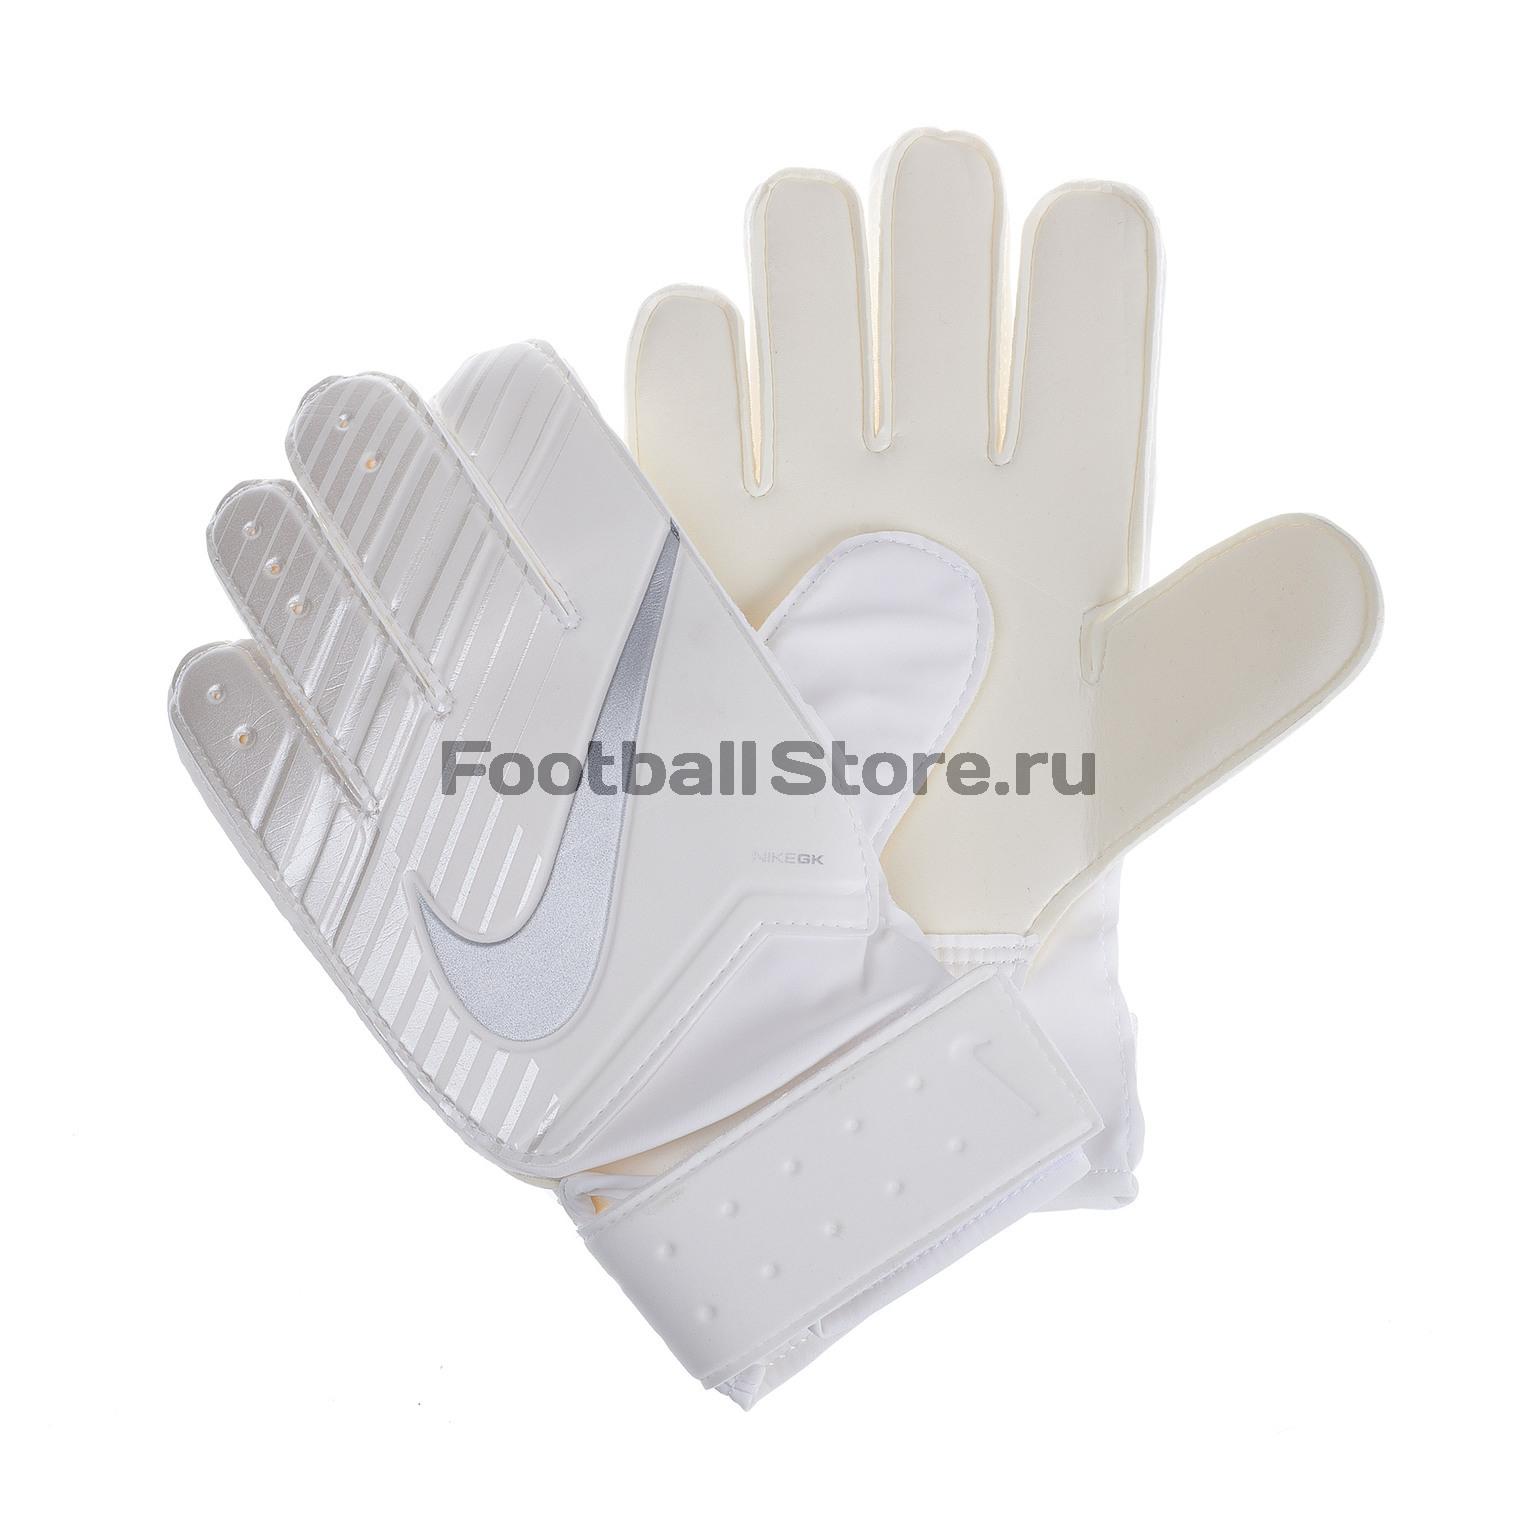 Перчатки вратарские Nike JR Match GS0343-100 цена